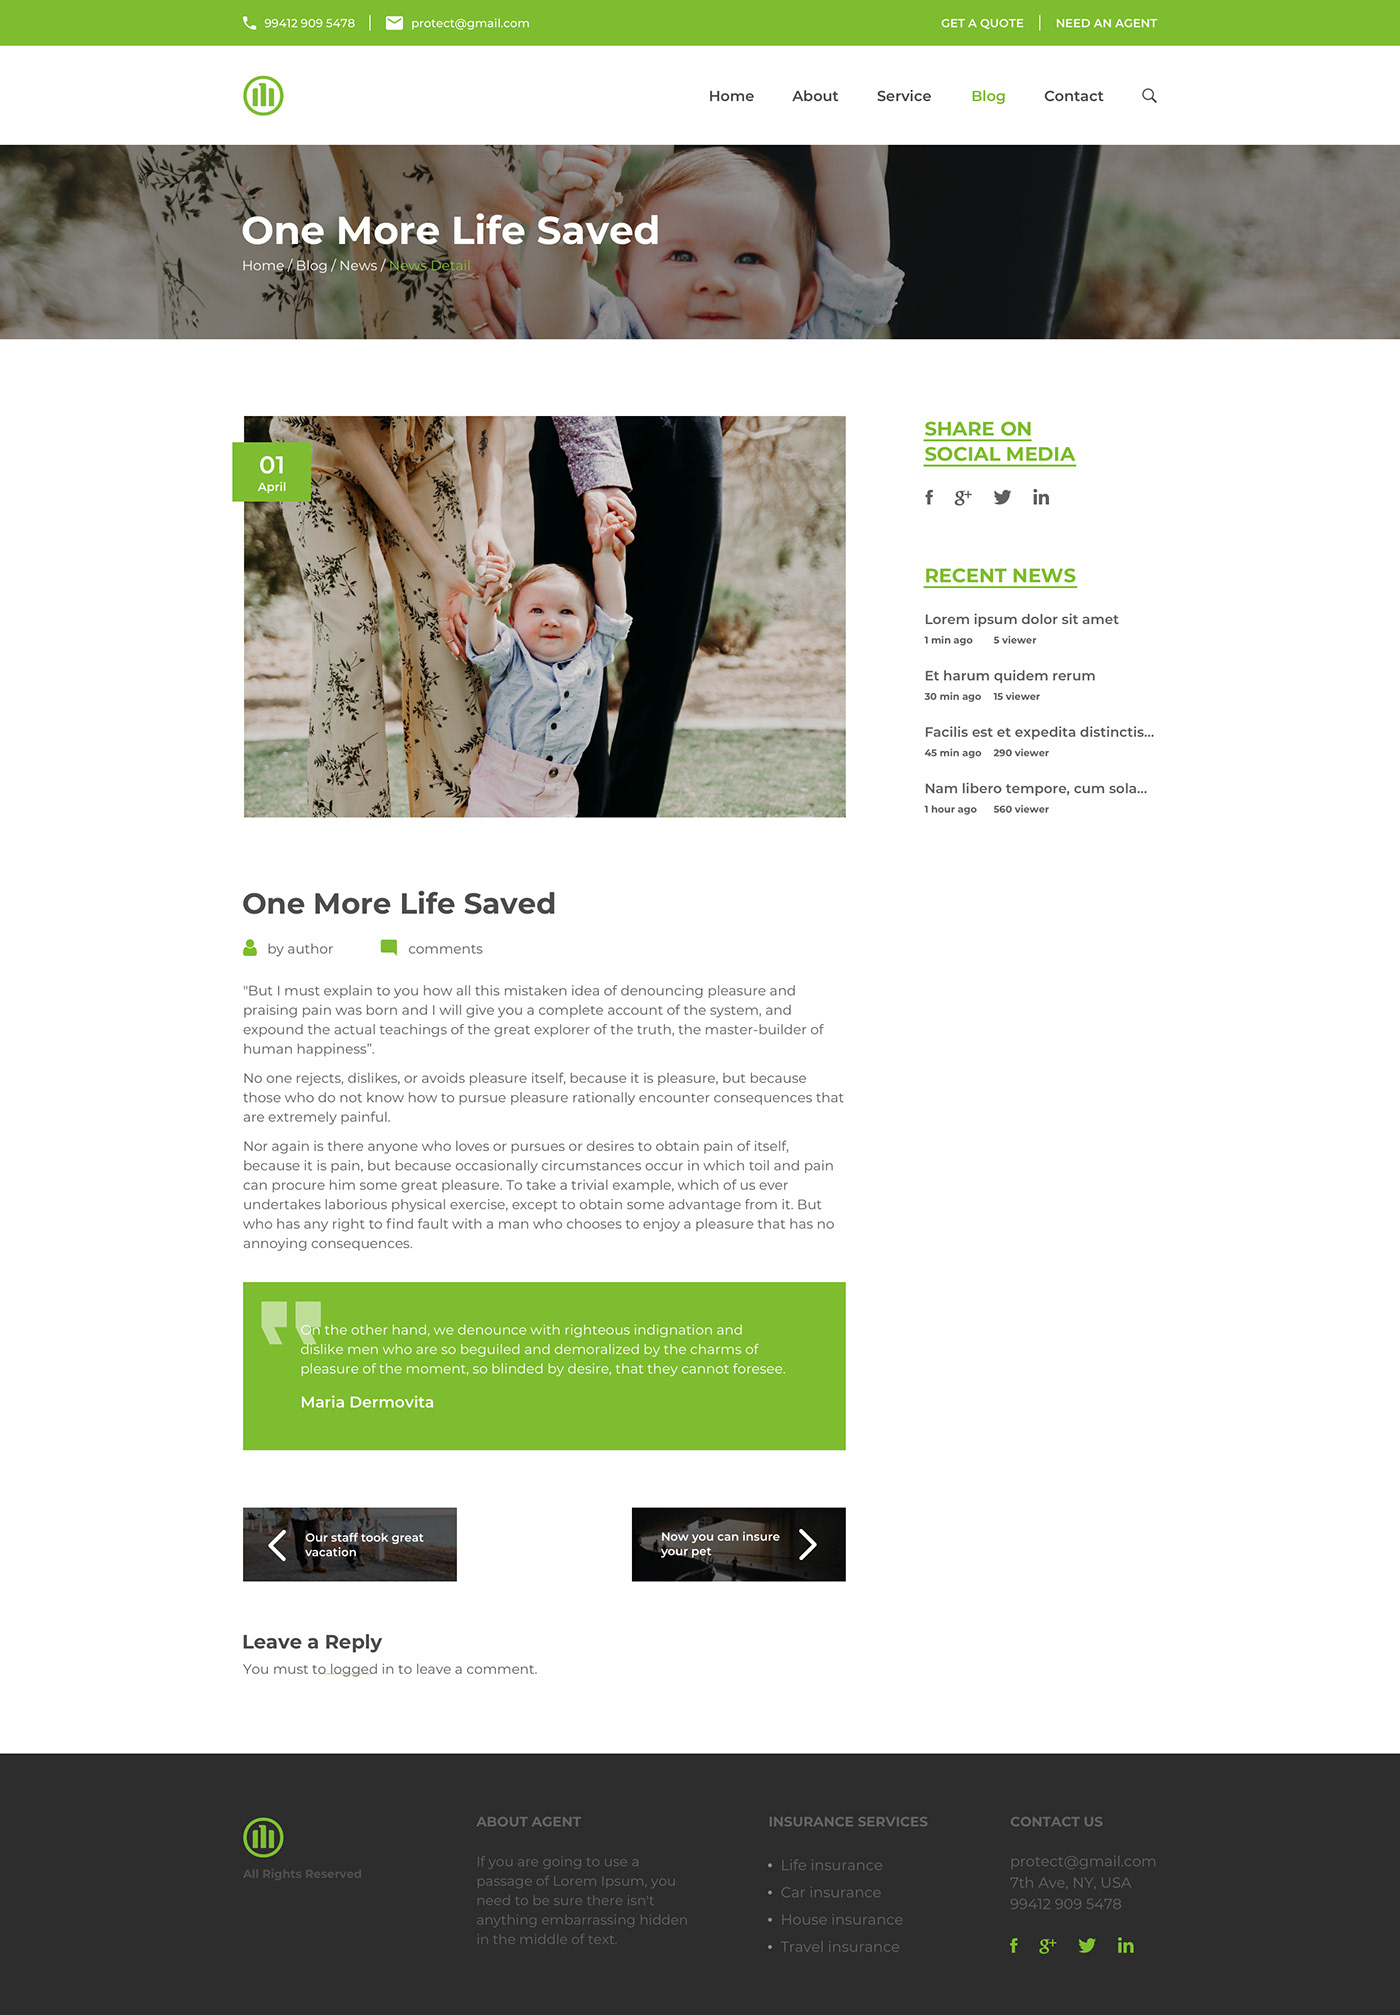 Redesign Website Concept for Allianz Insurance on Behance